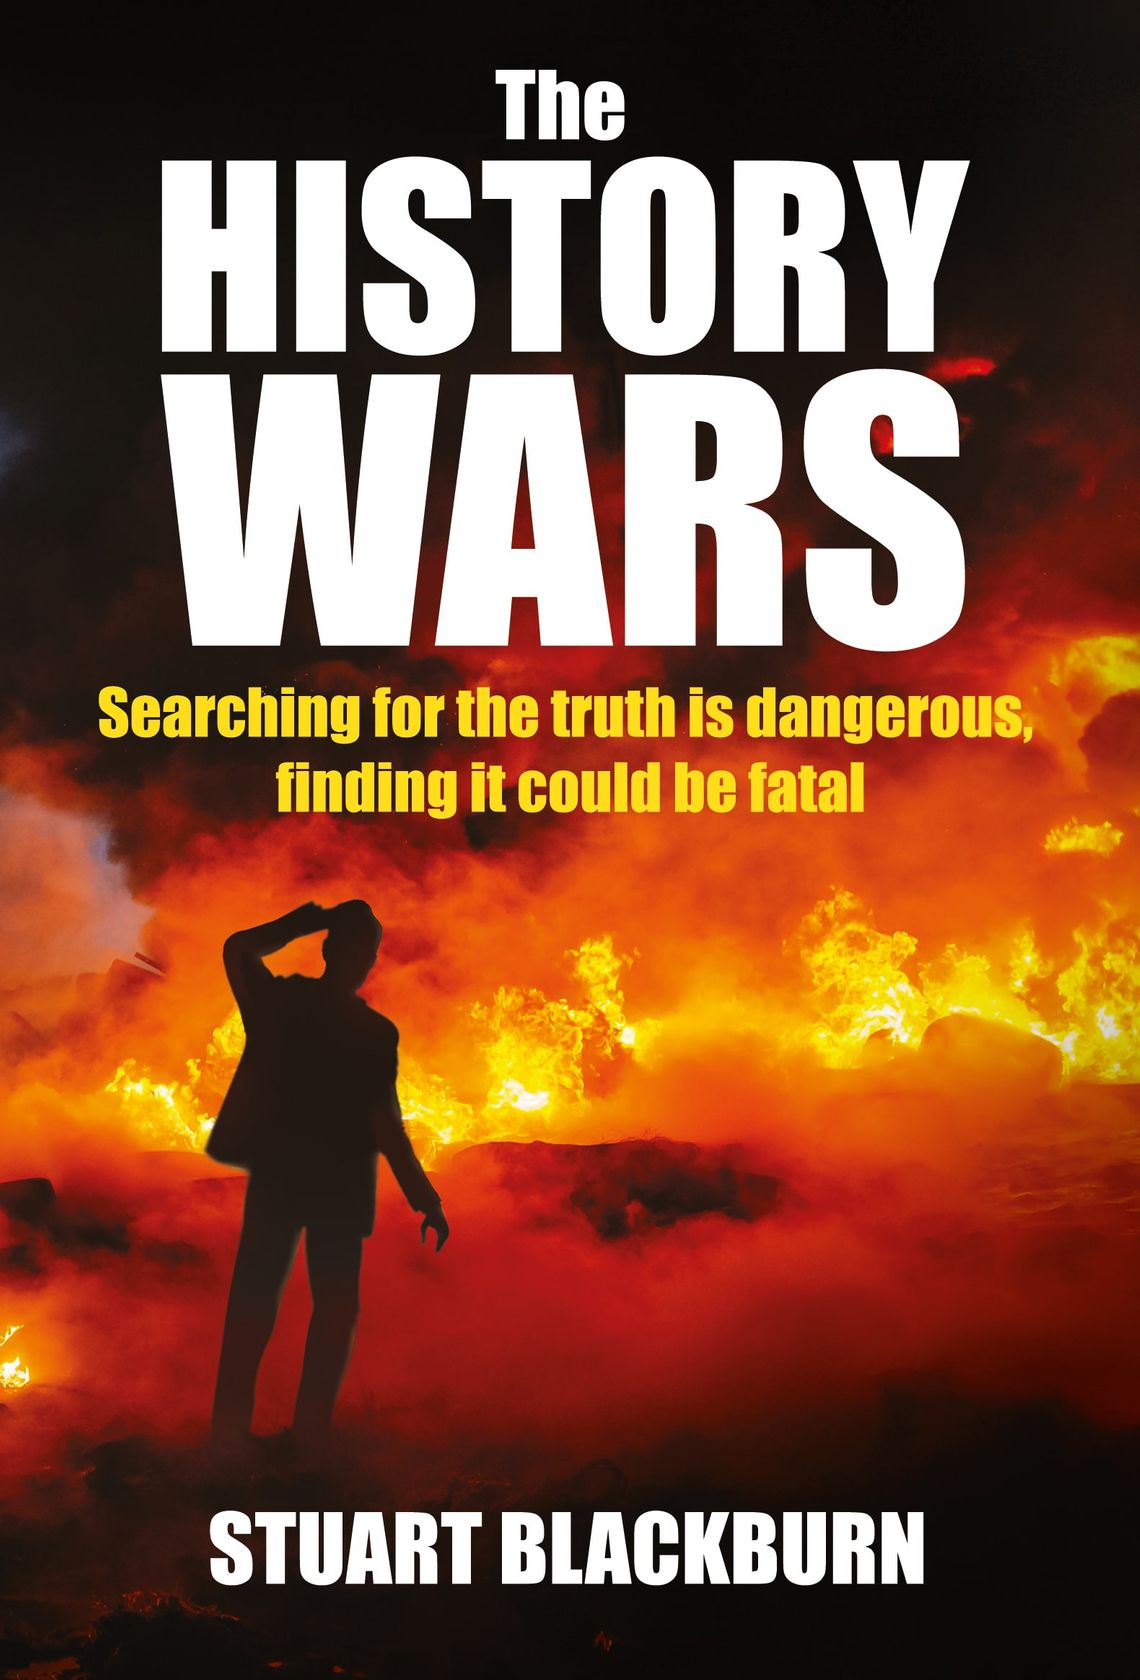 'The History Wars' by Stuart Blackburn